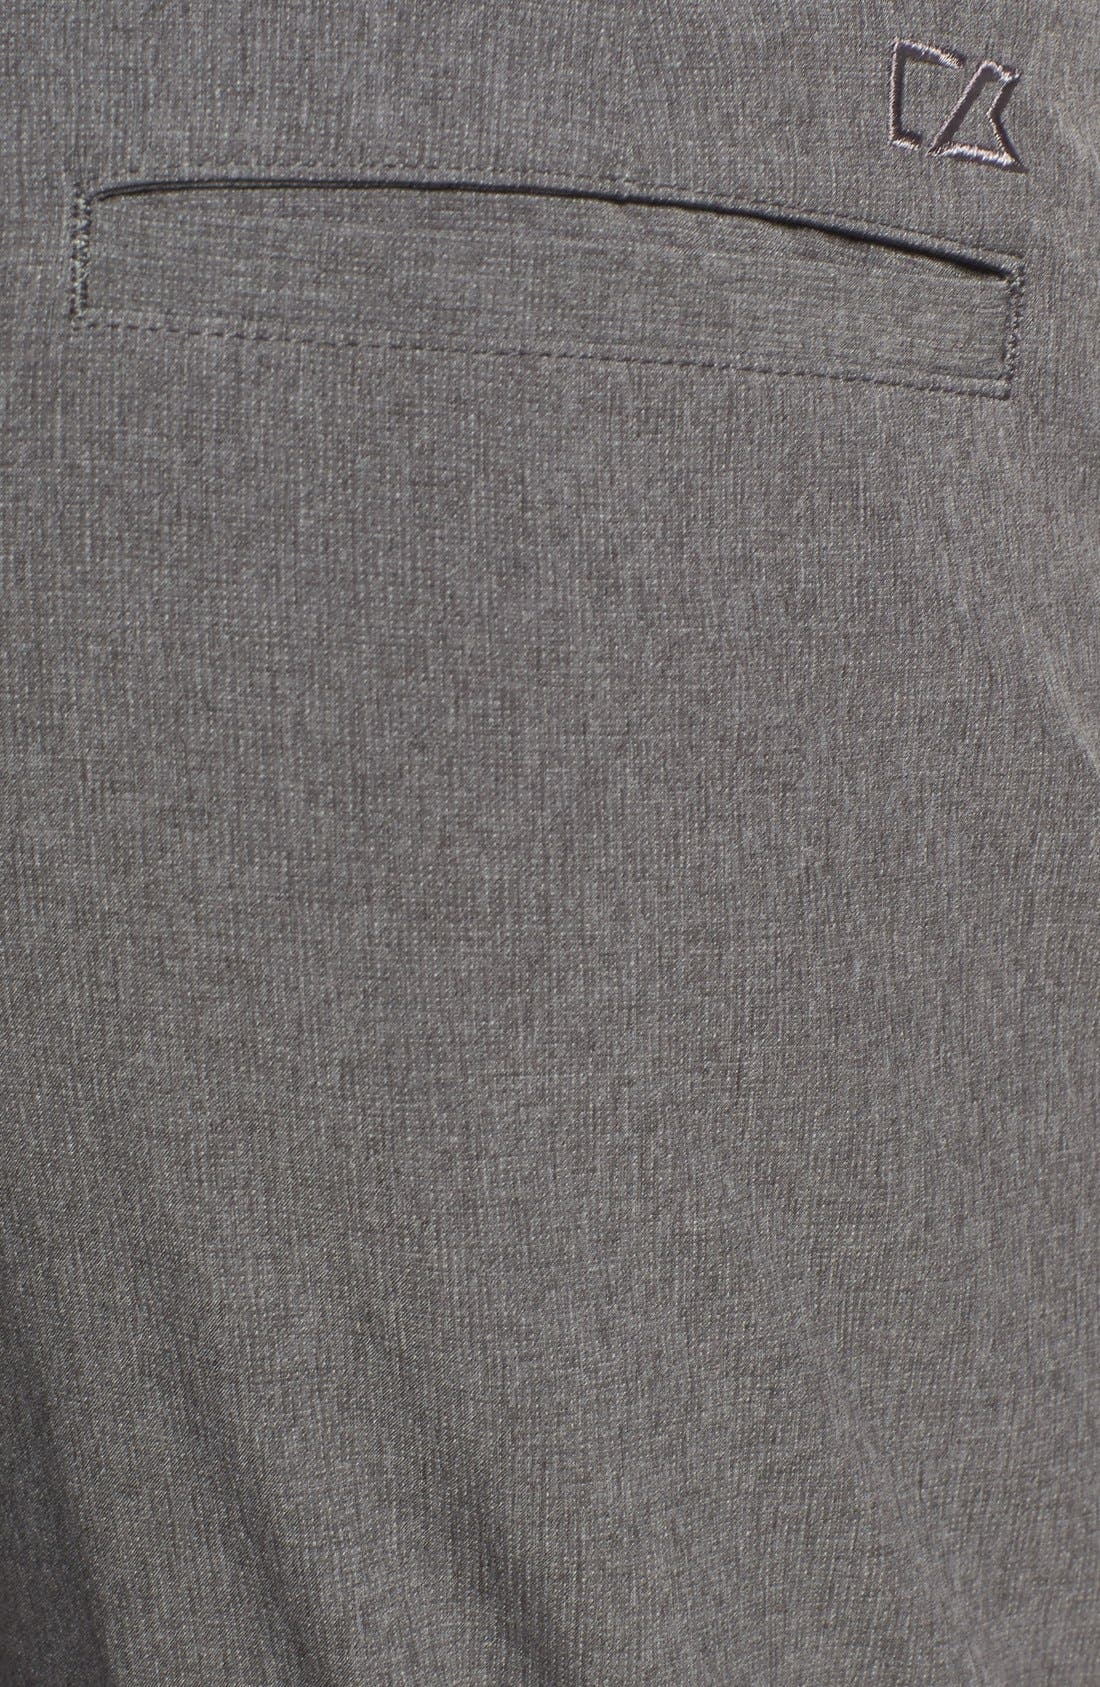 ,                             'Bainbridge' DryTec Flat Front Pants,                             Alternate thumbnail 3, color,                             IRON